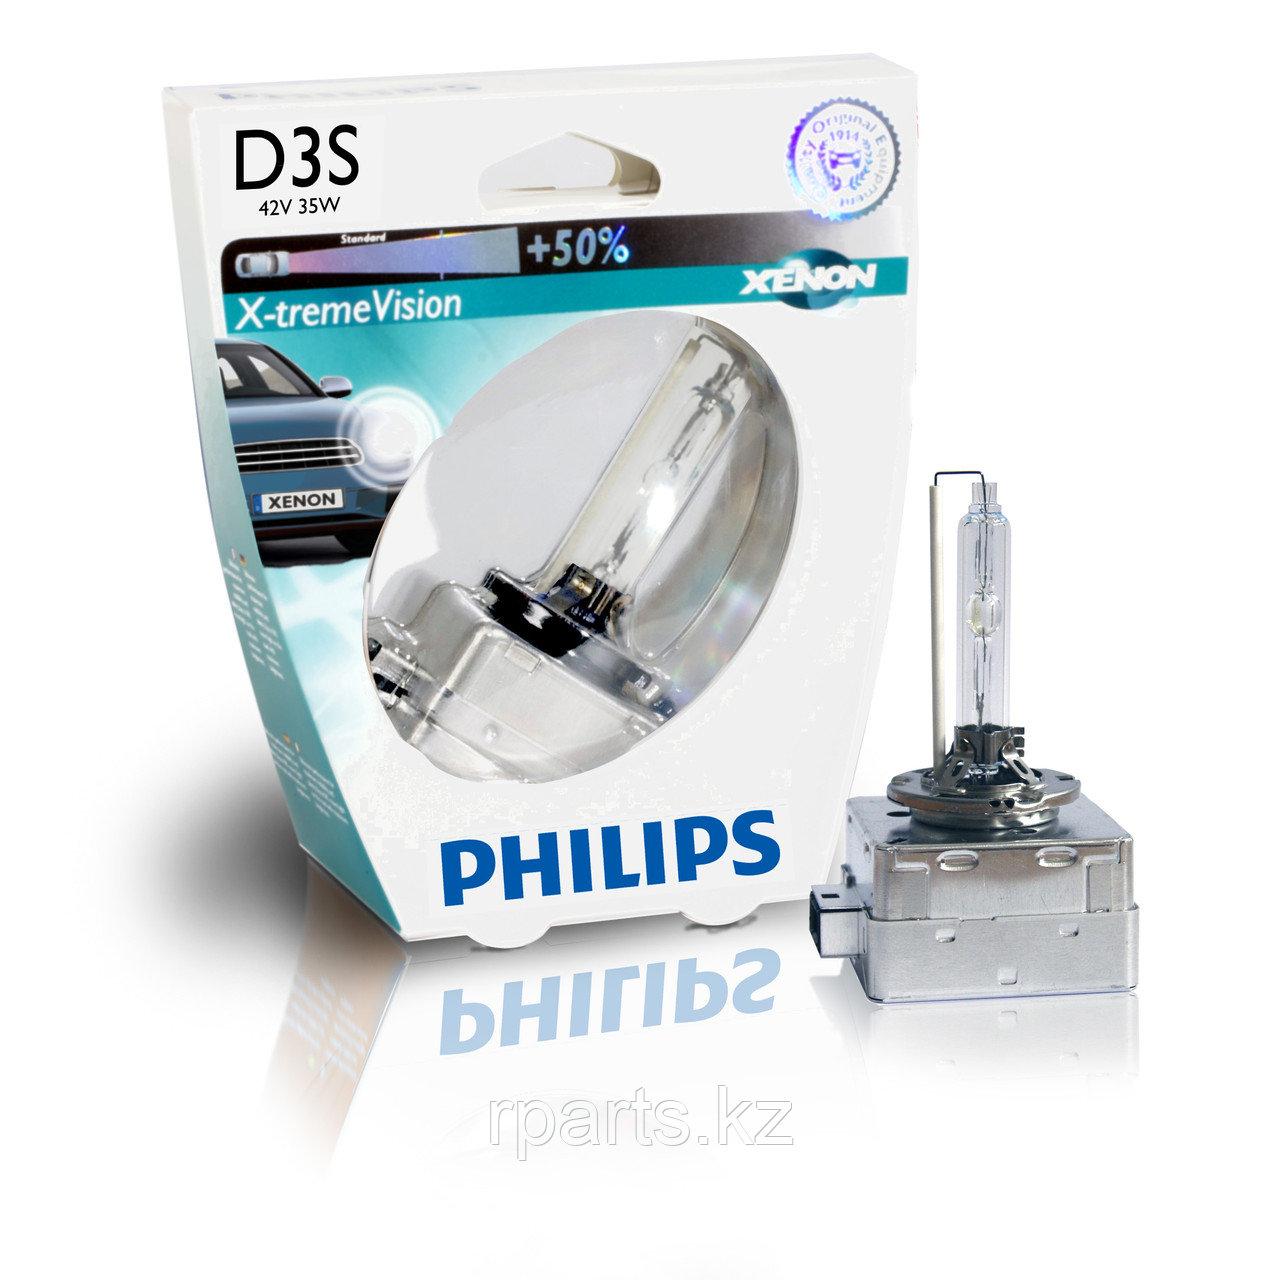 Ксеноновая лампа Philips Xenon XtremeVision D3S